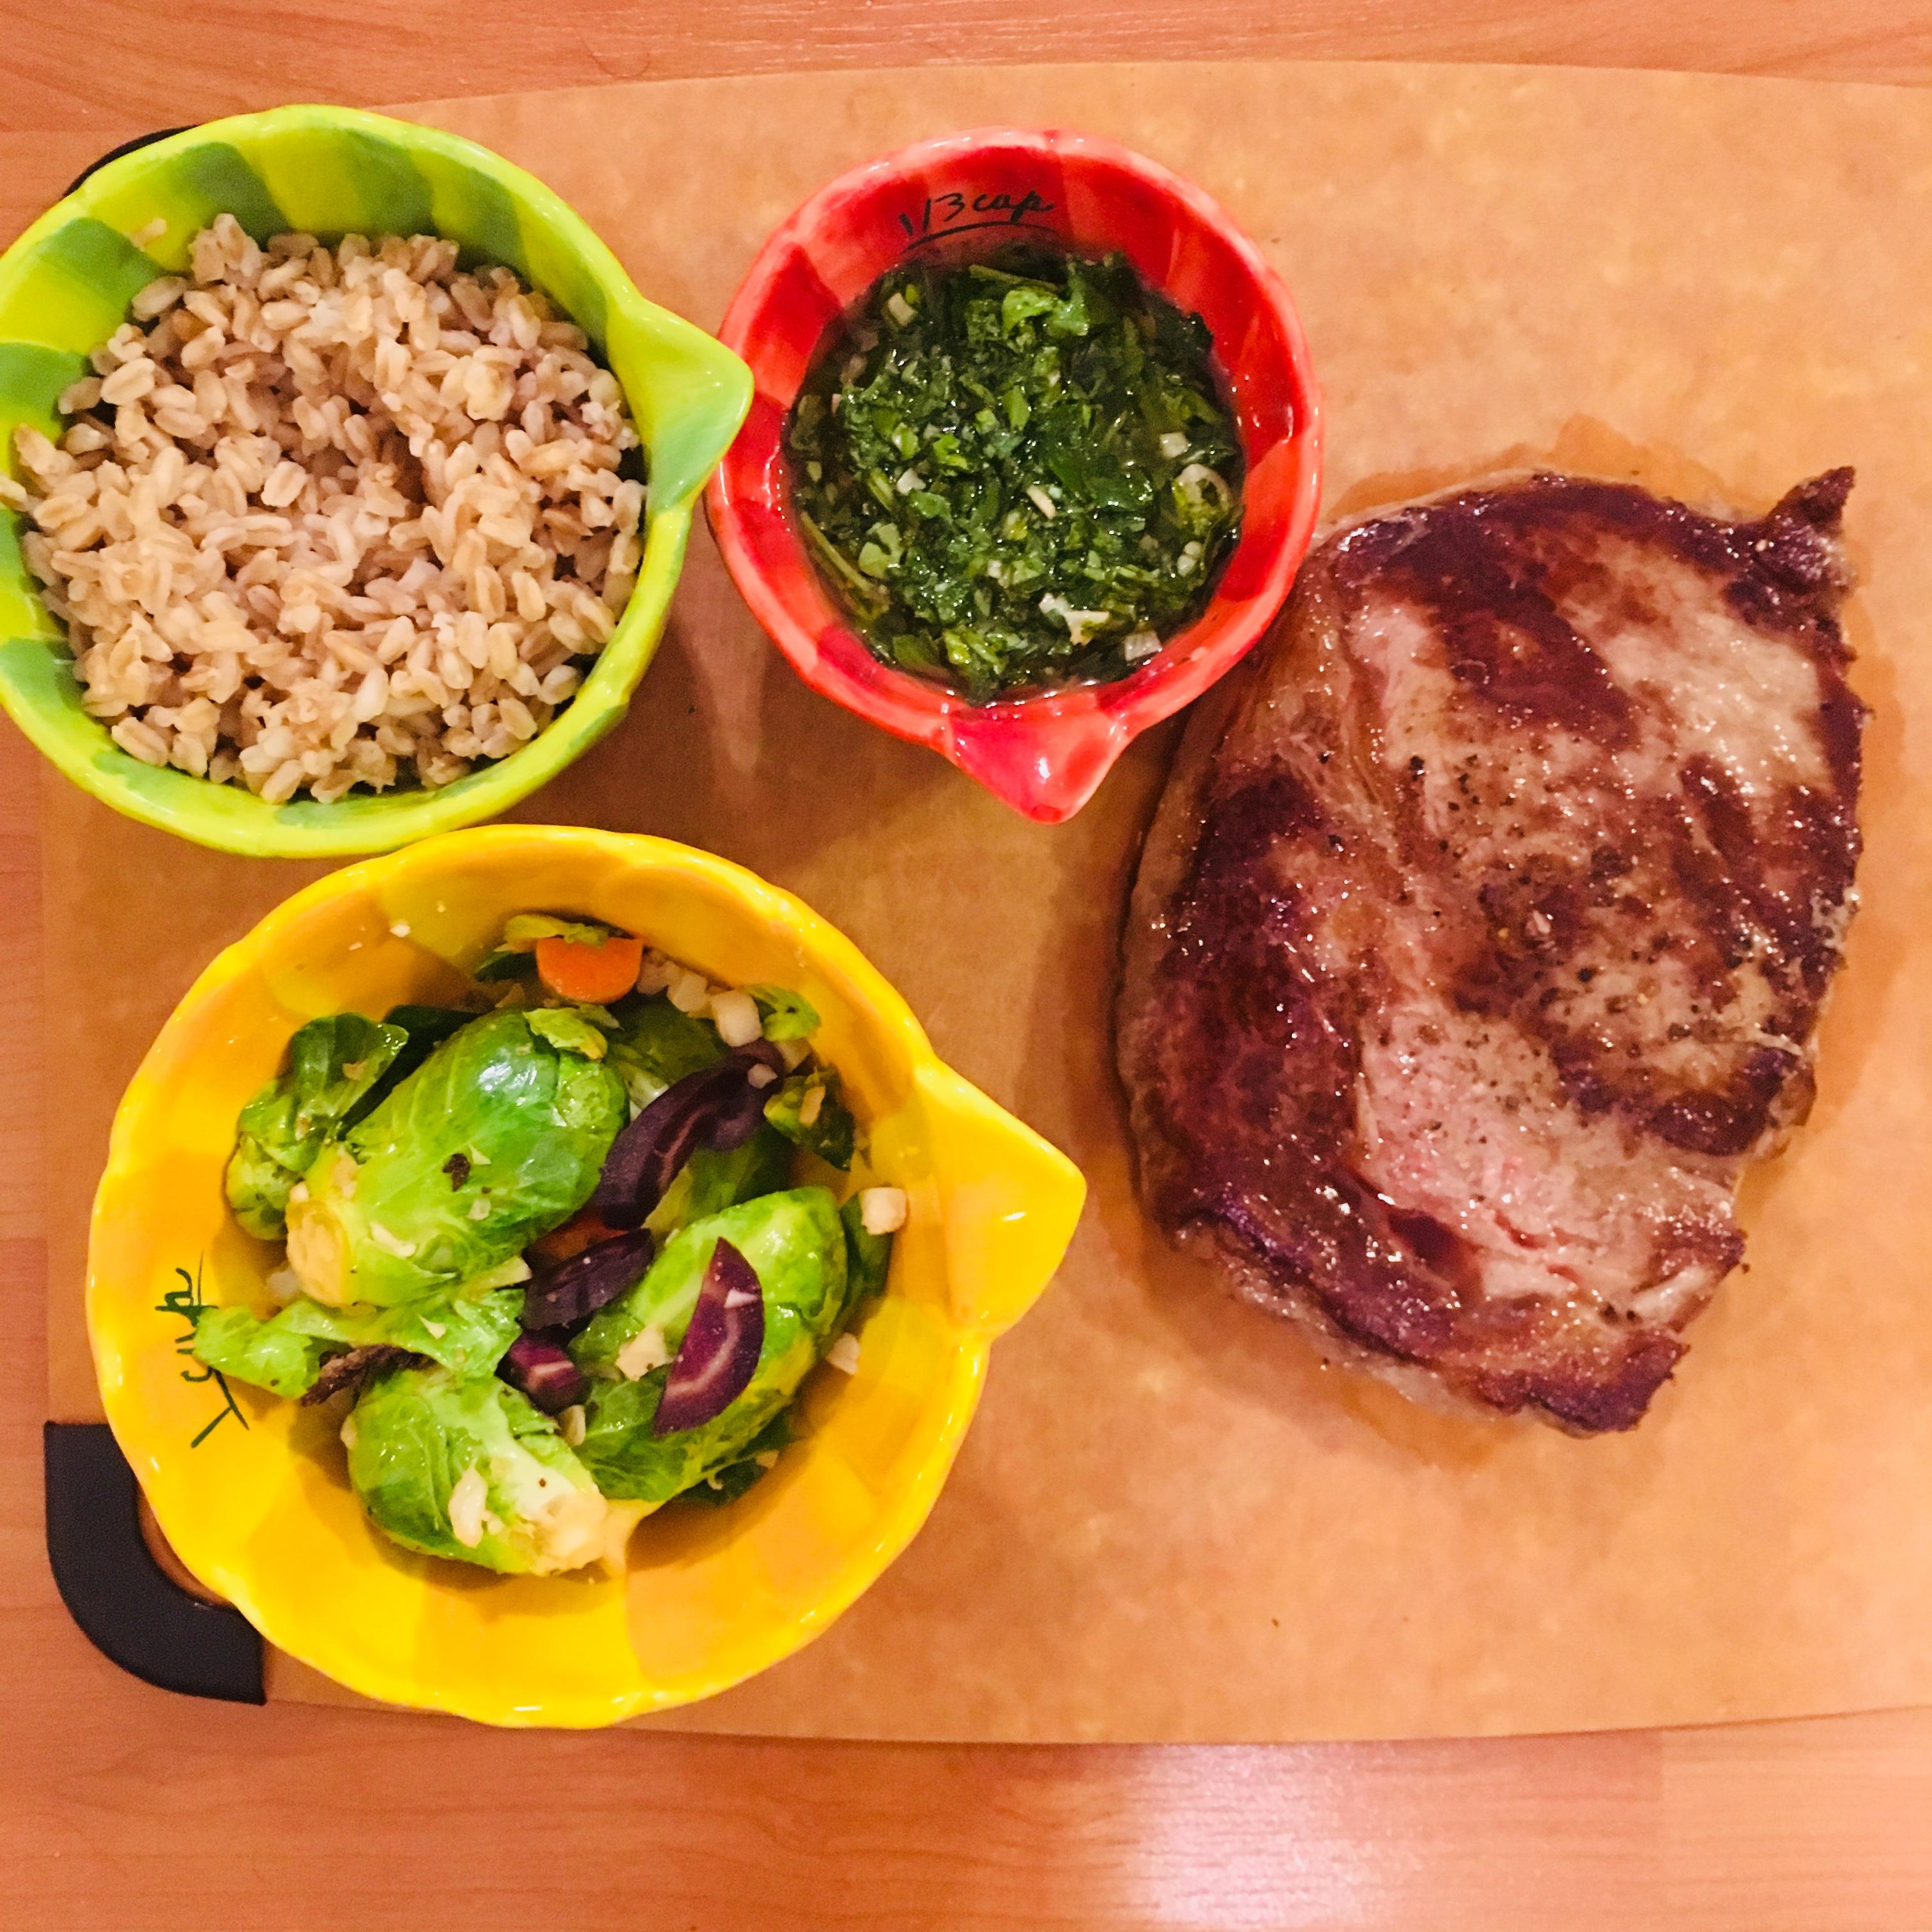 Steak_Chimichurri_Farro_Veggies